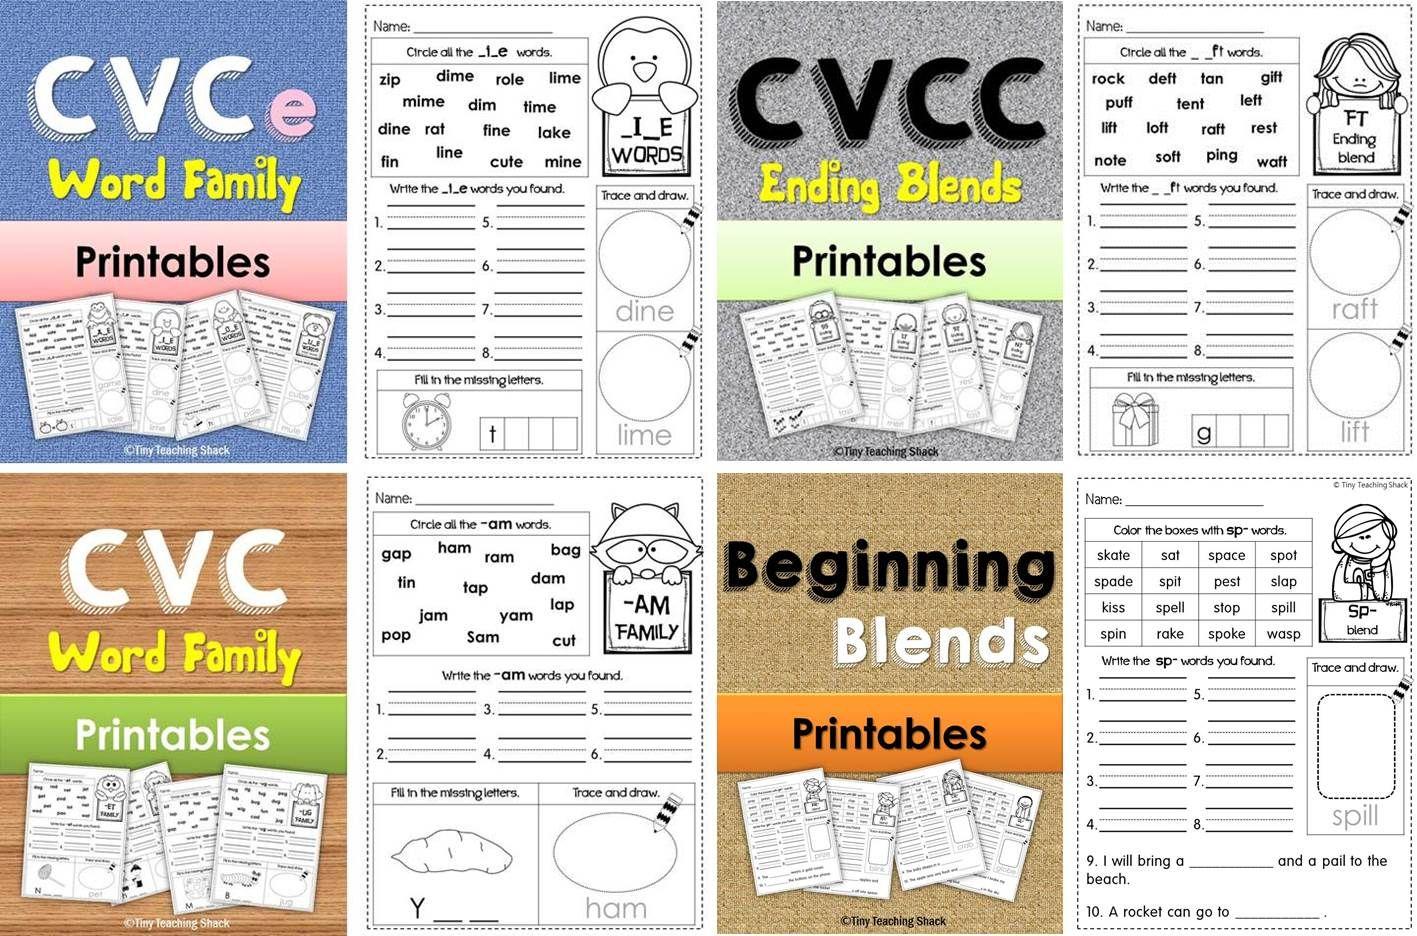 Phonics Worksheets Cvc Cvce Cvcc Ending Blend Beginning Blend